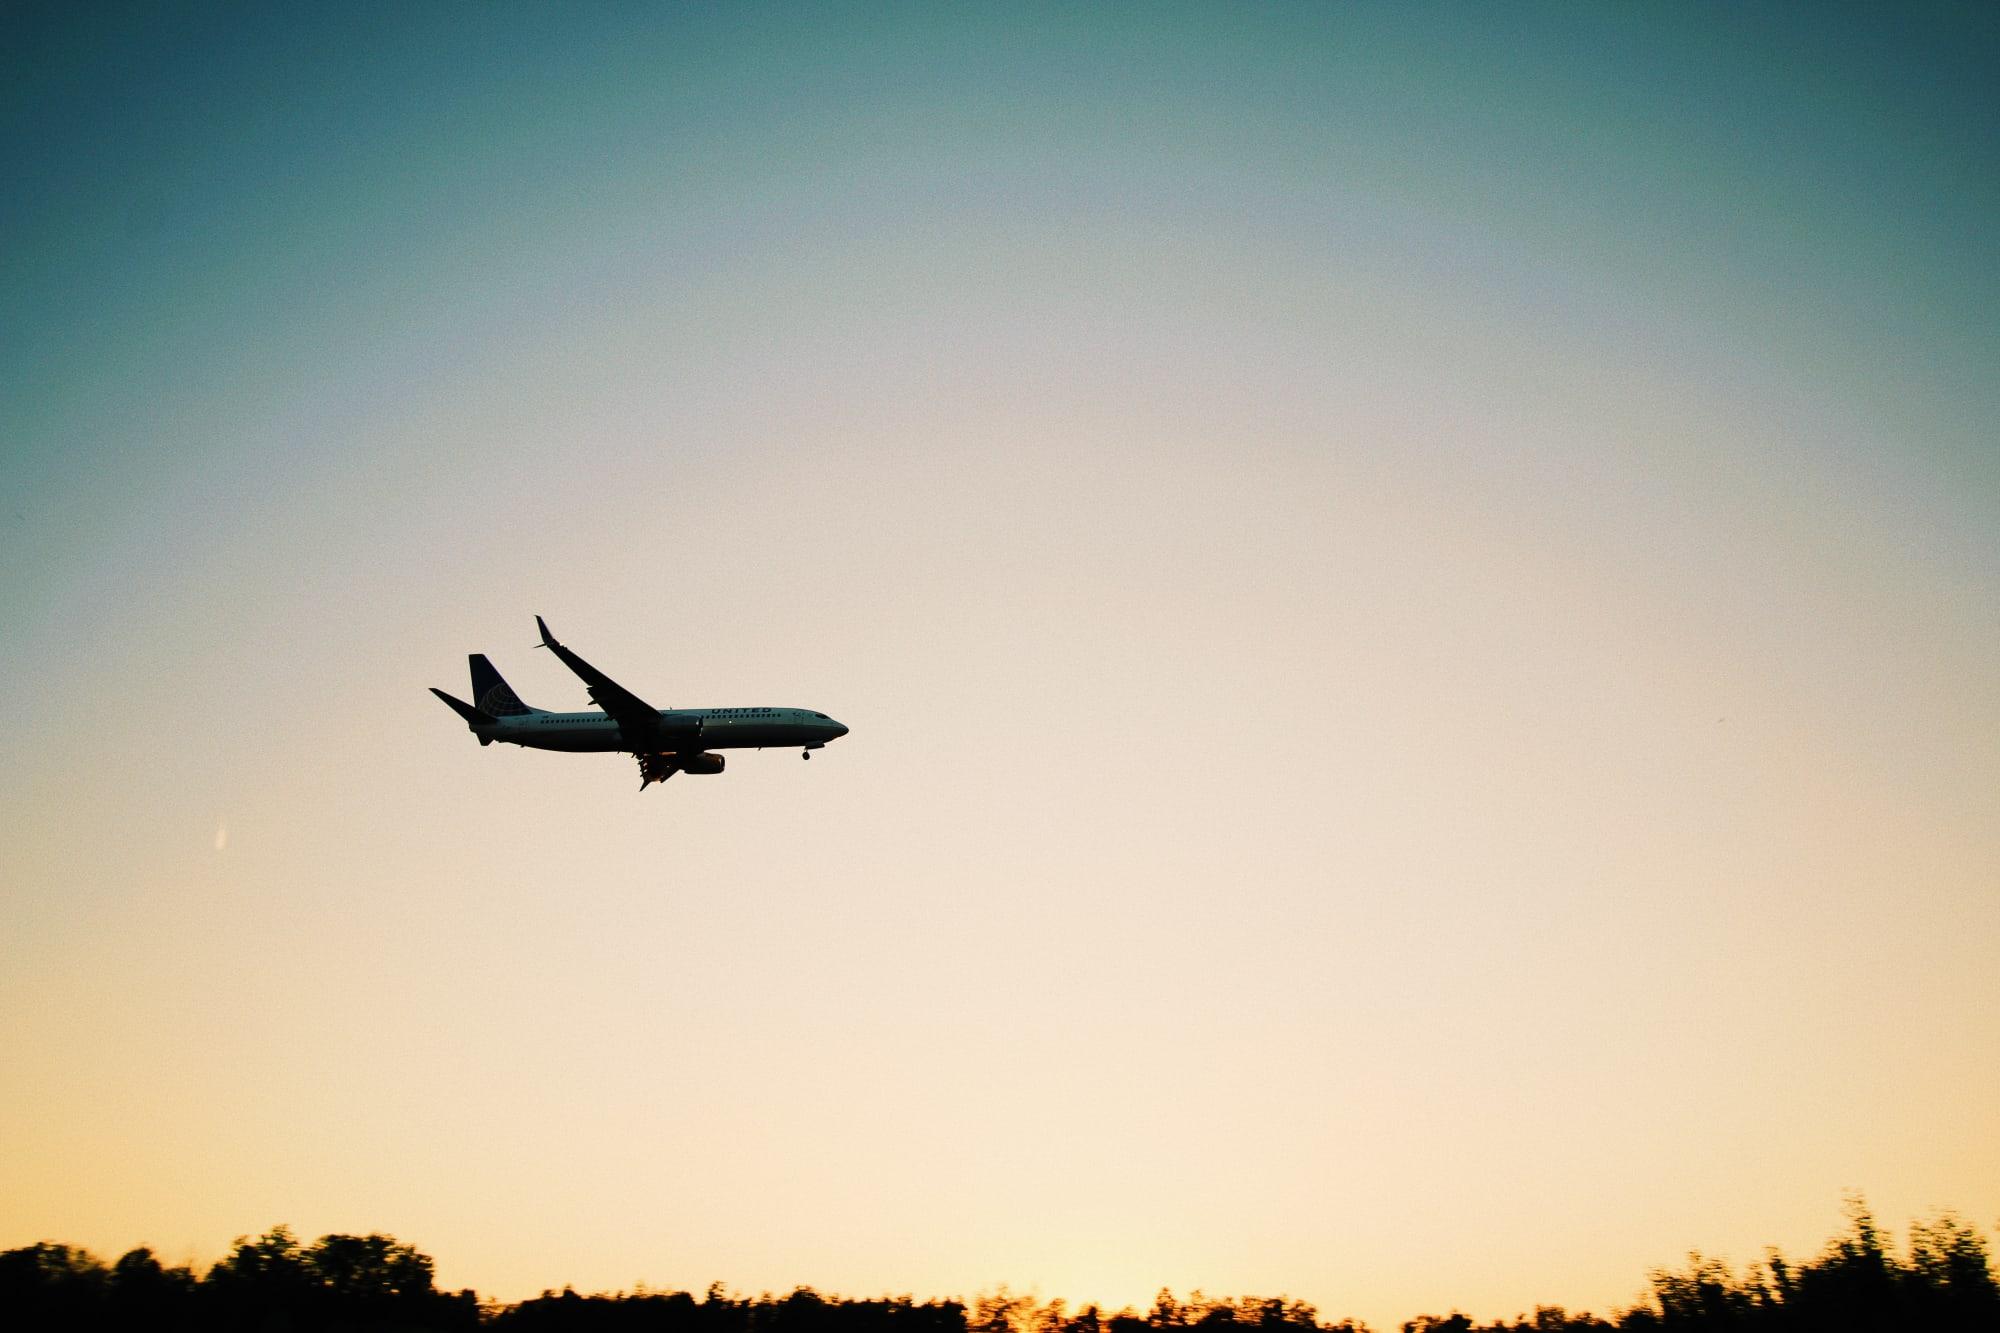 Local Airlines urged Uniform Protocols for LGUs